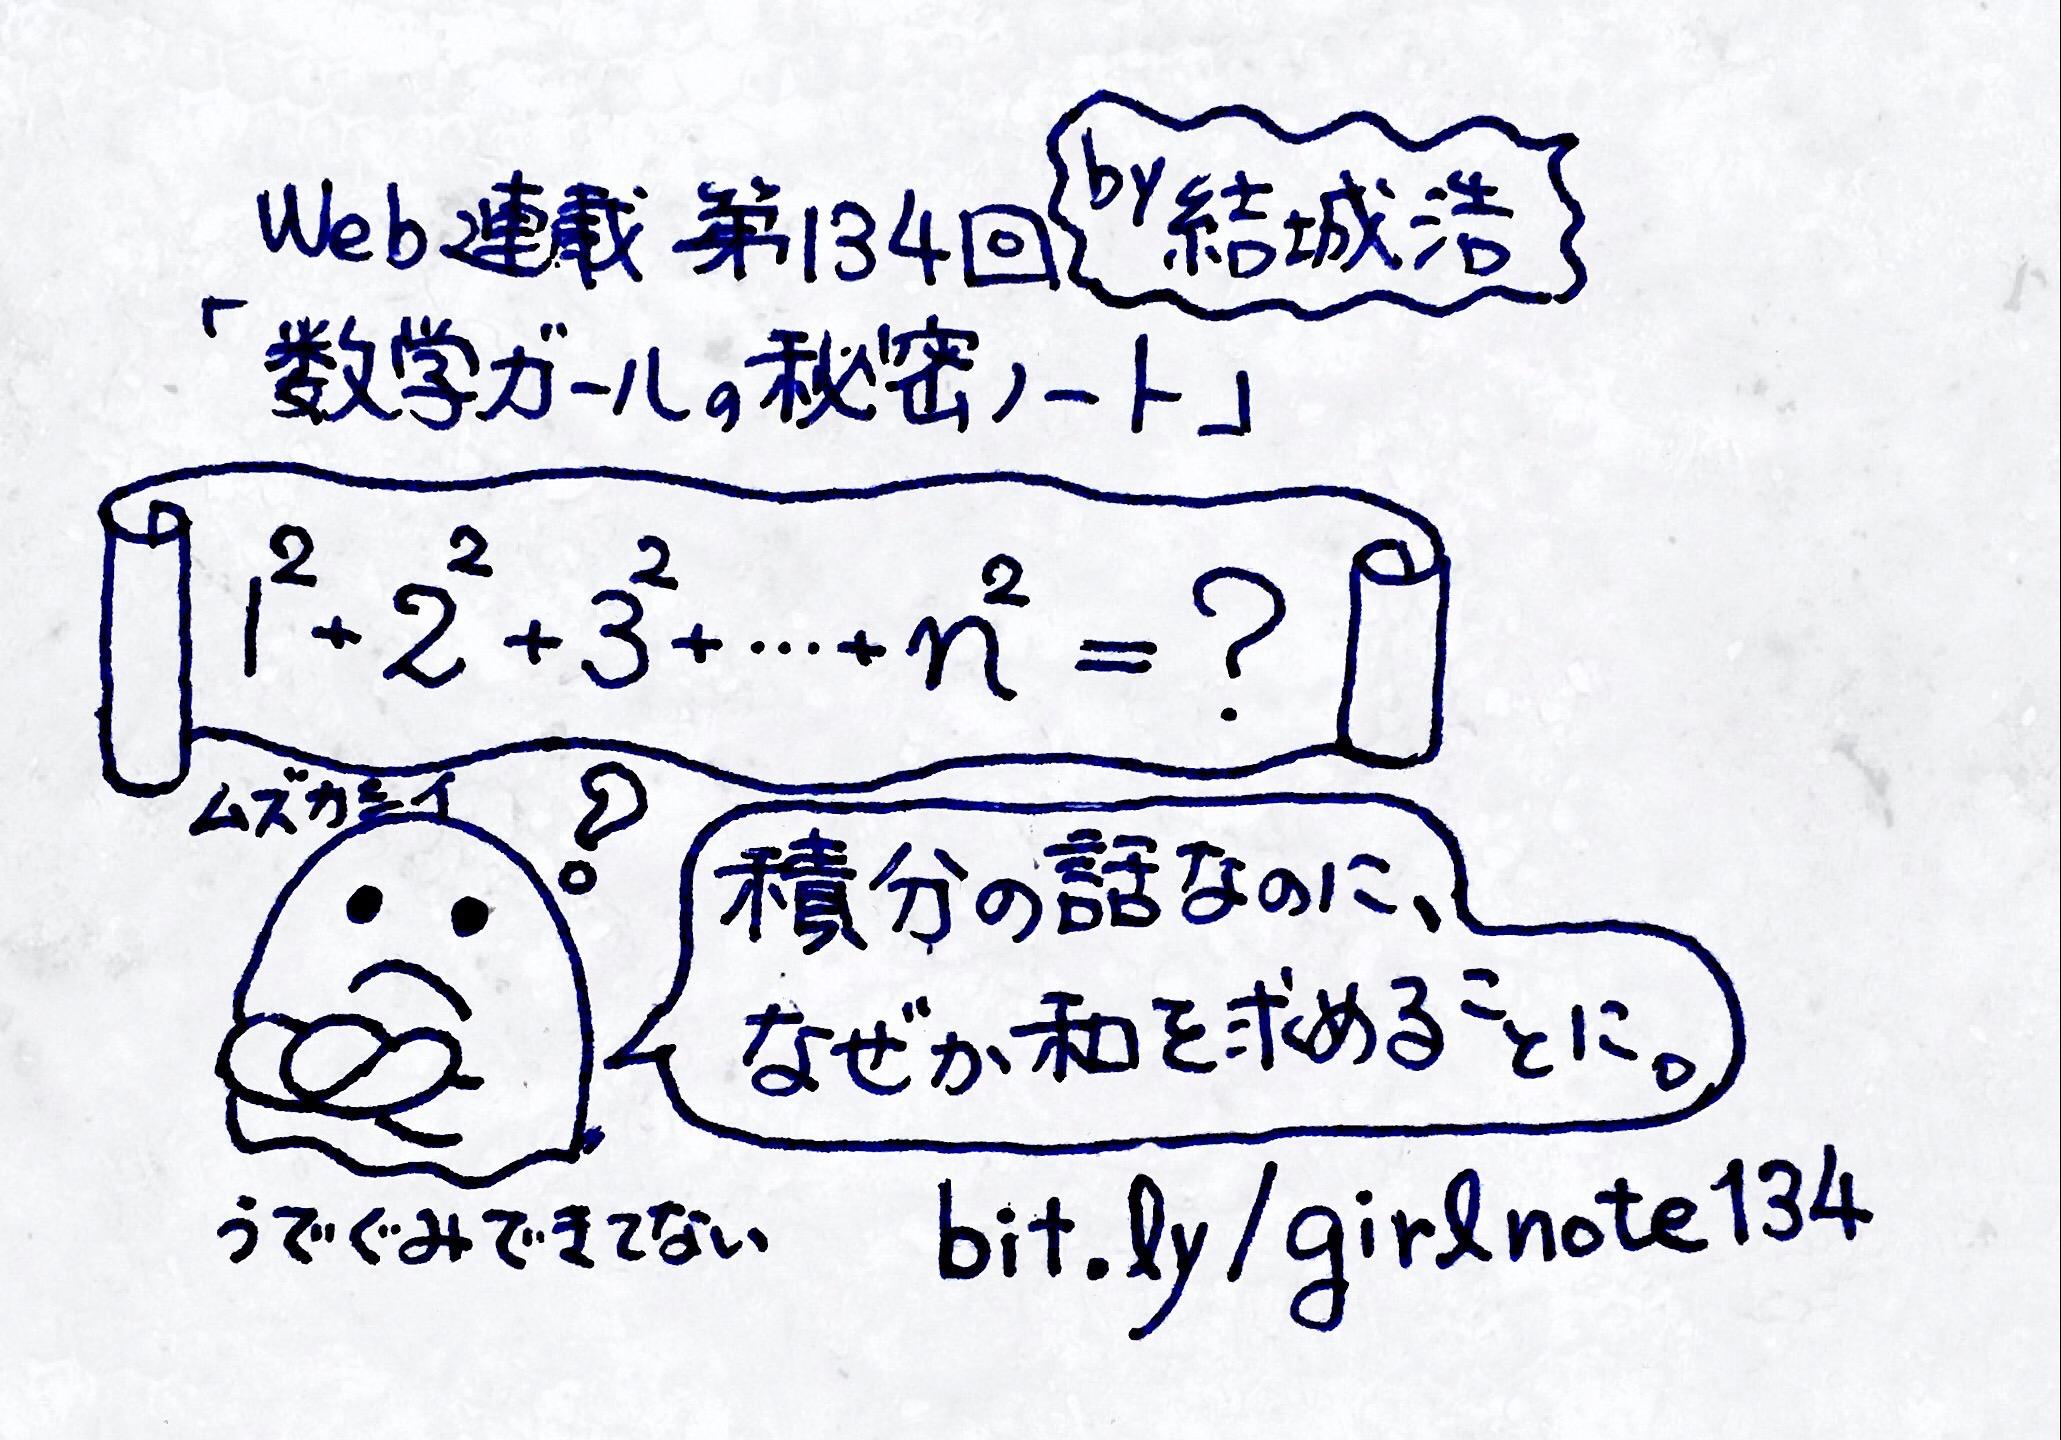 2015-10-23_girlnote134.jpg